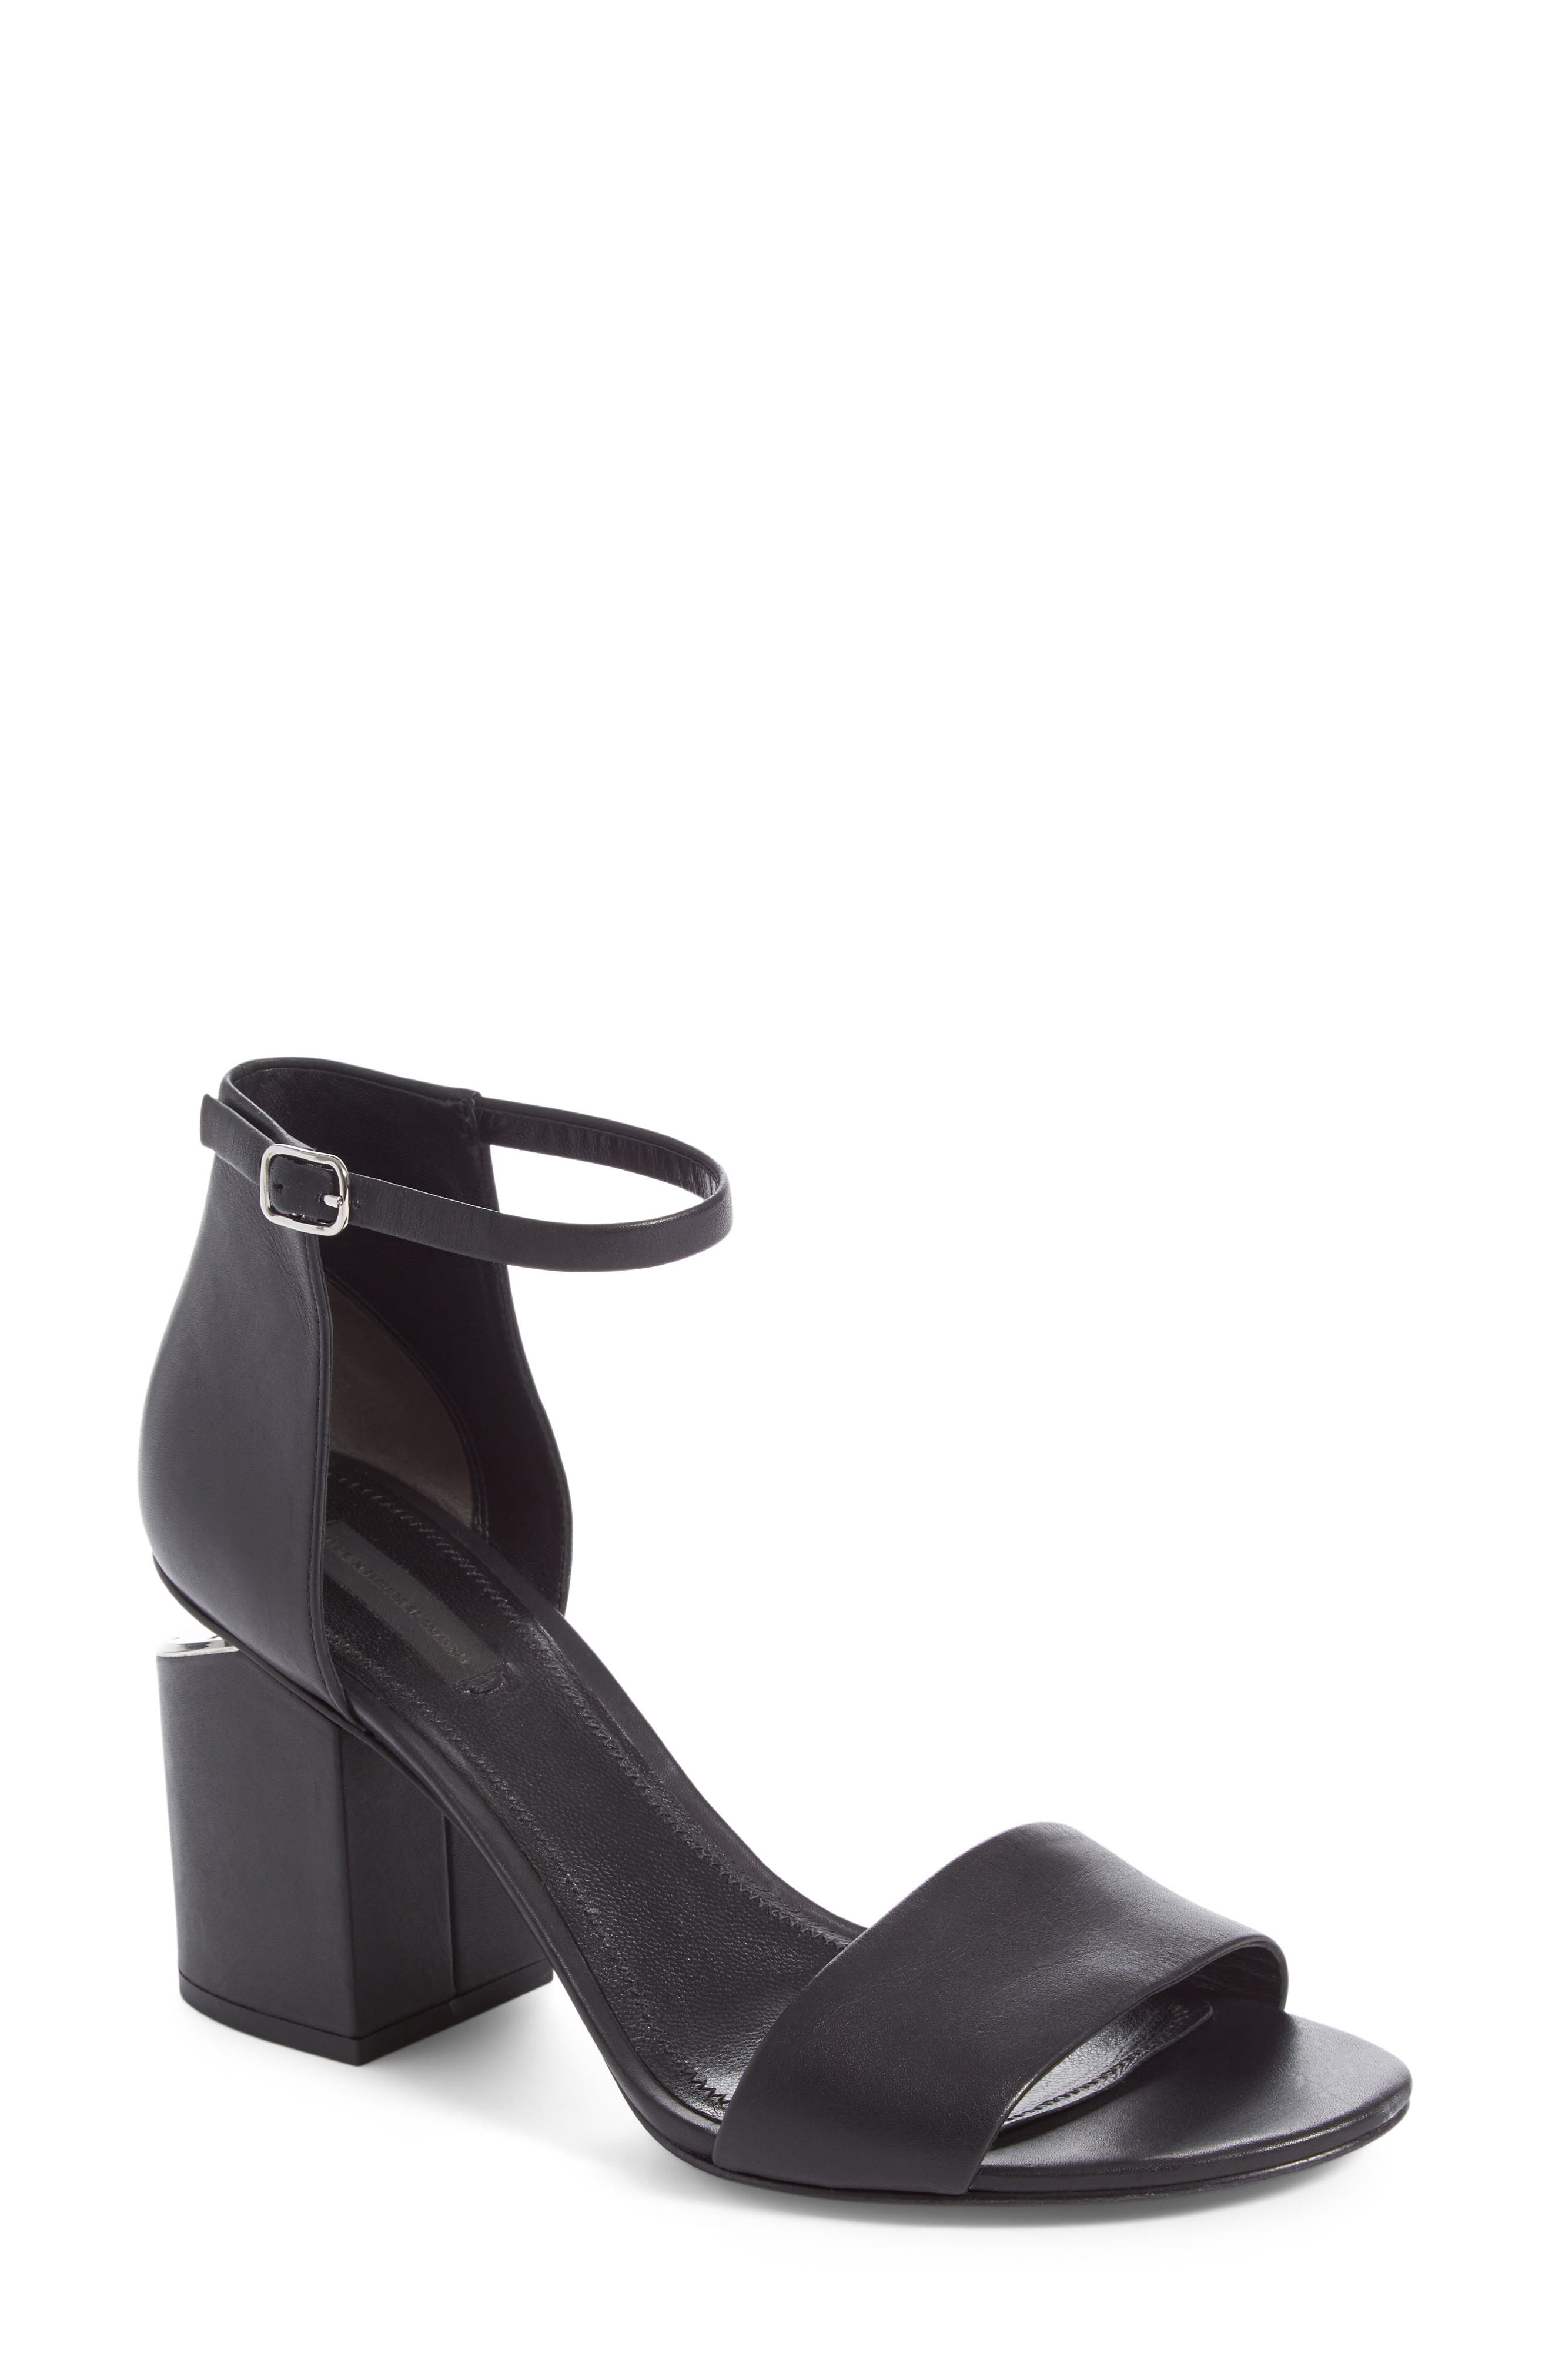 'Abby' Ankle Strap Sandal,                             Main thumbnail 1, color,                             Black